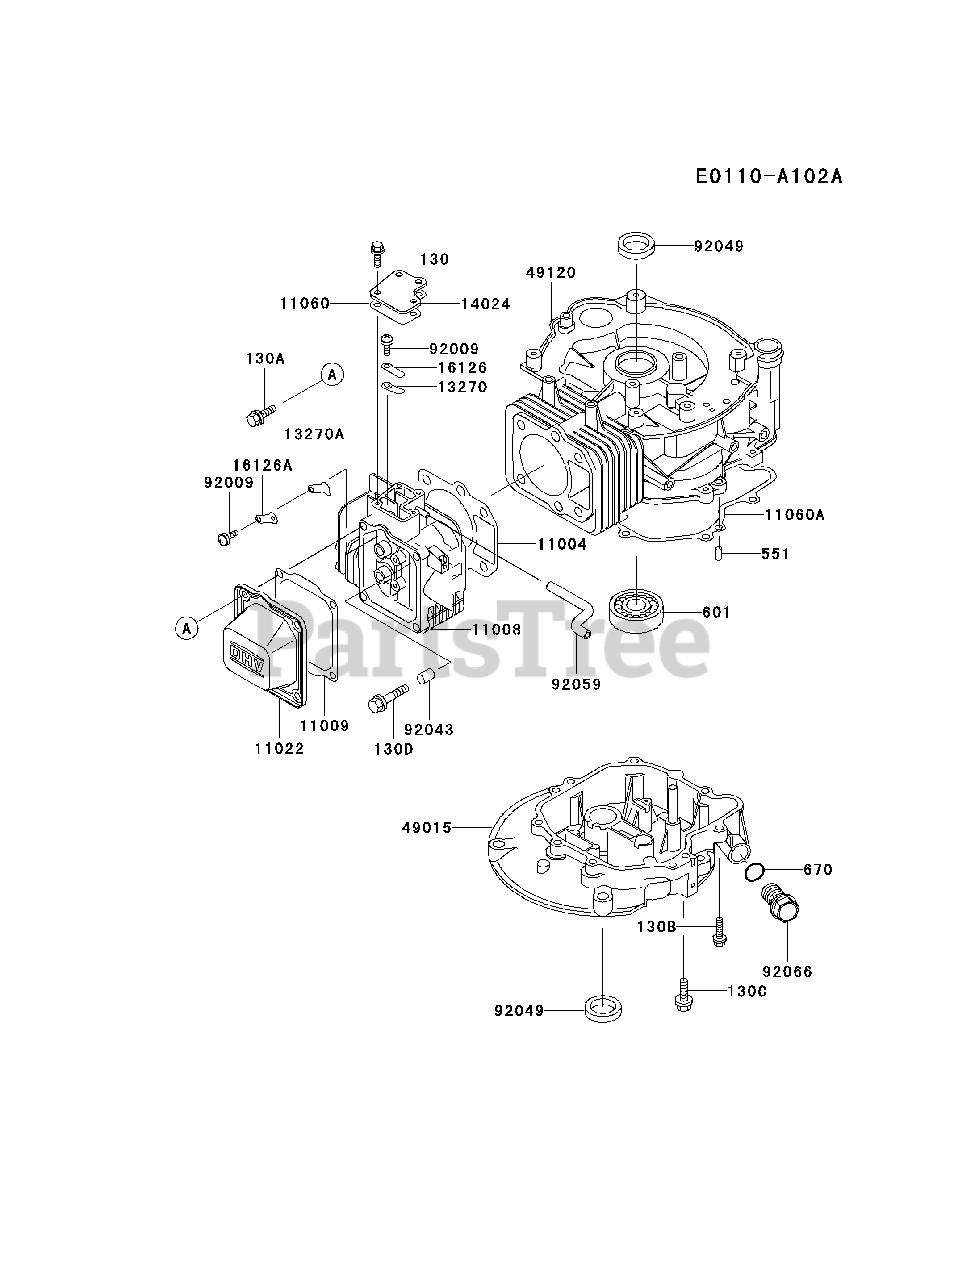 Kawasaki Parts on the CYLINDER/CRANKCASE Diagram for